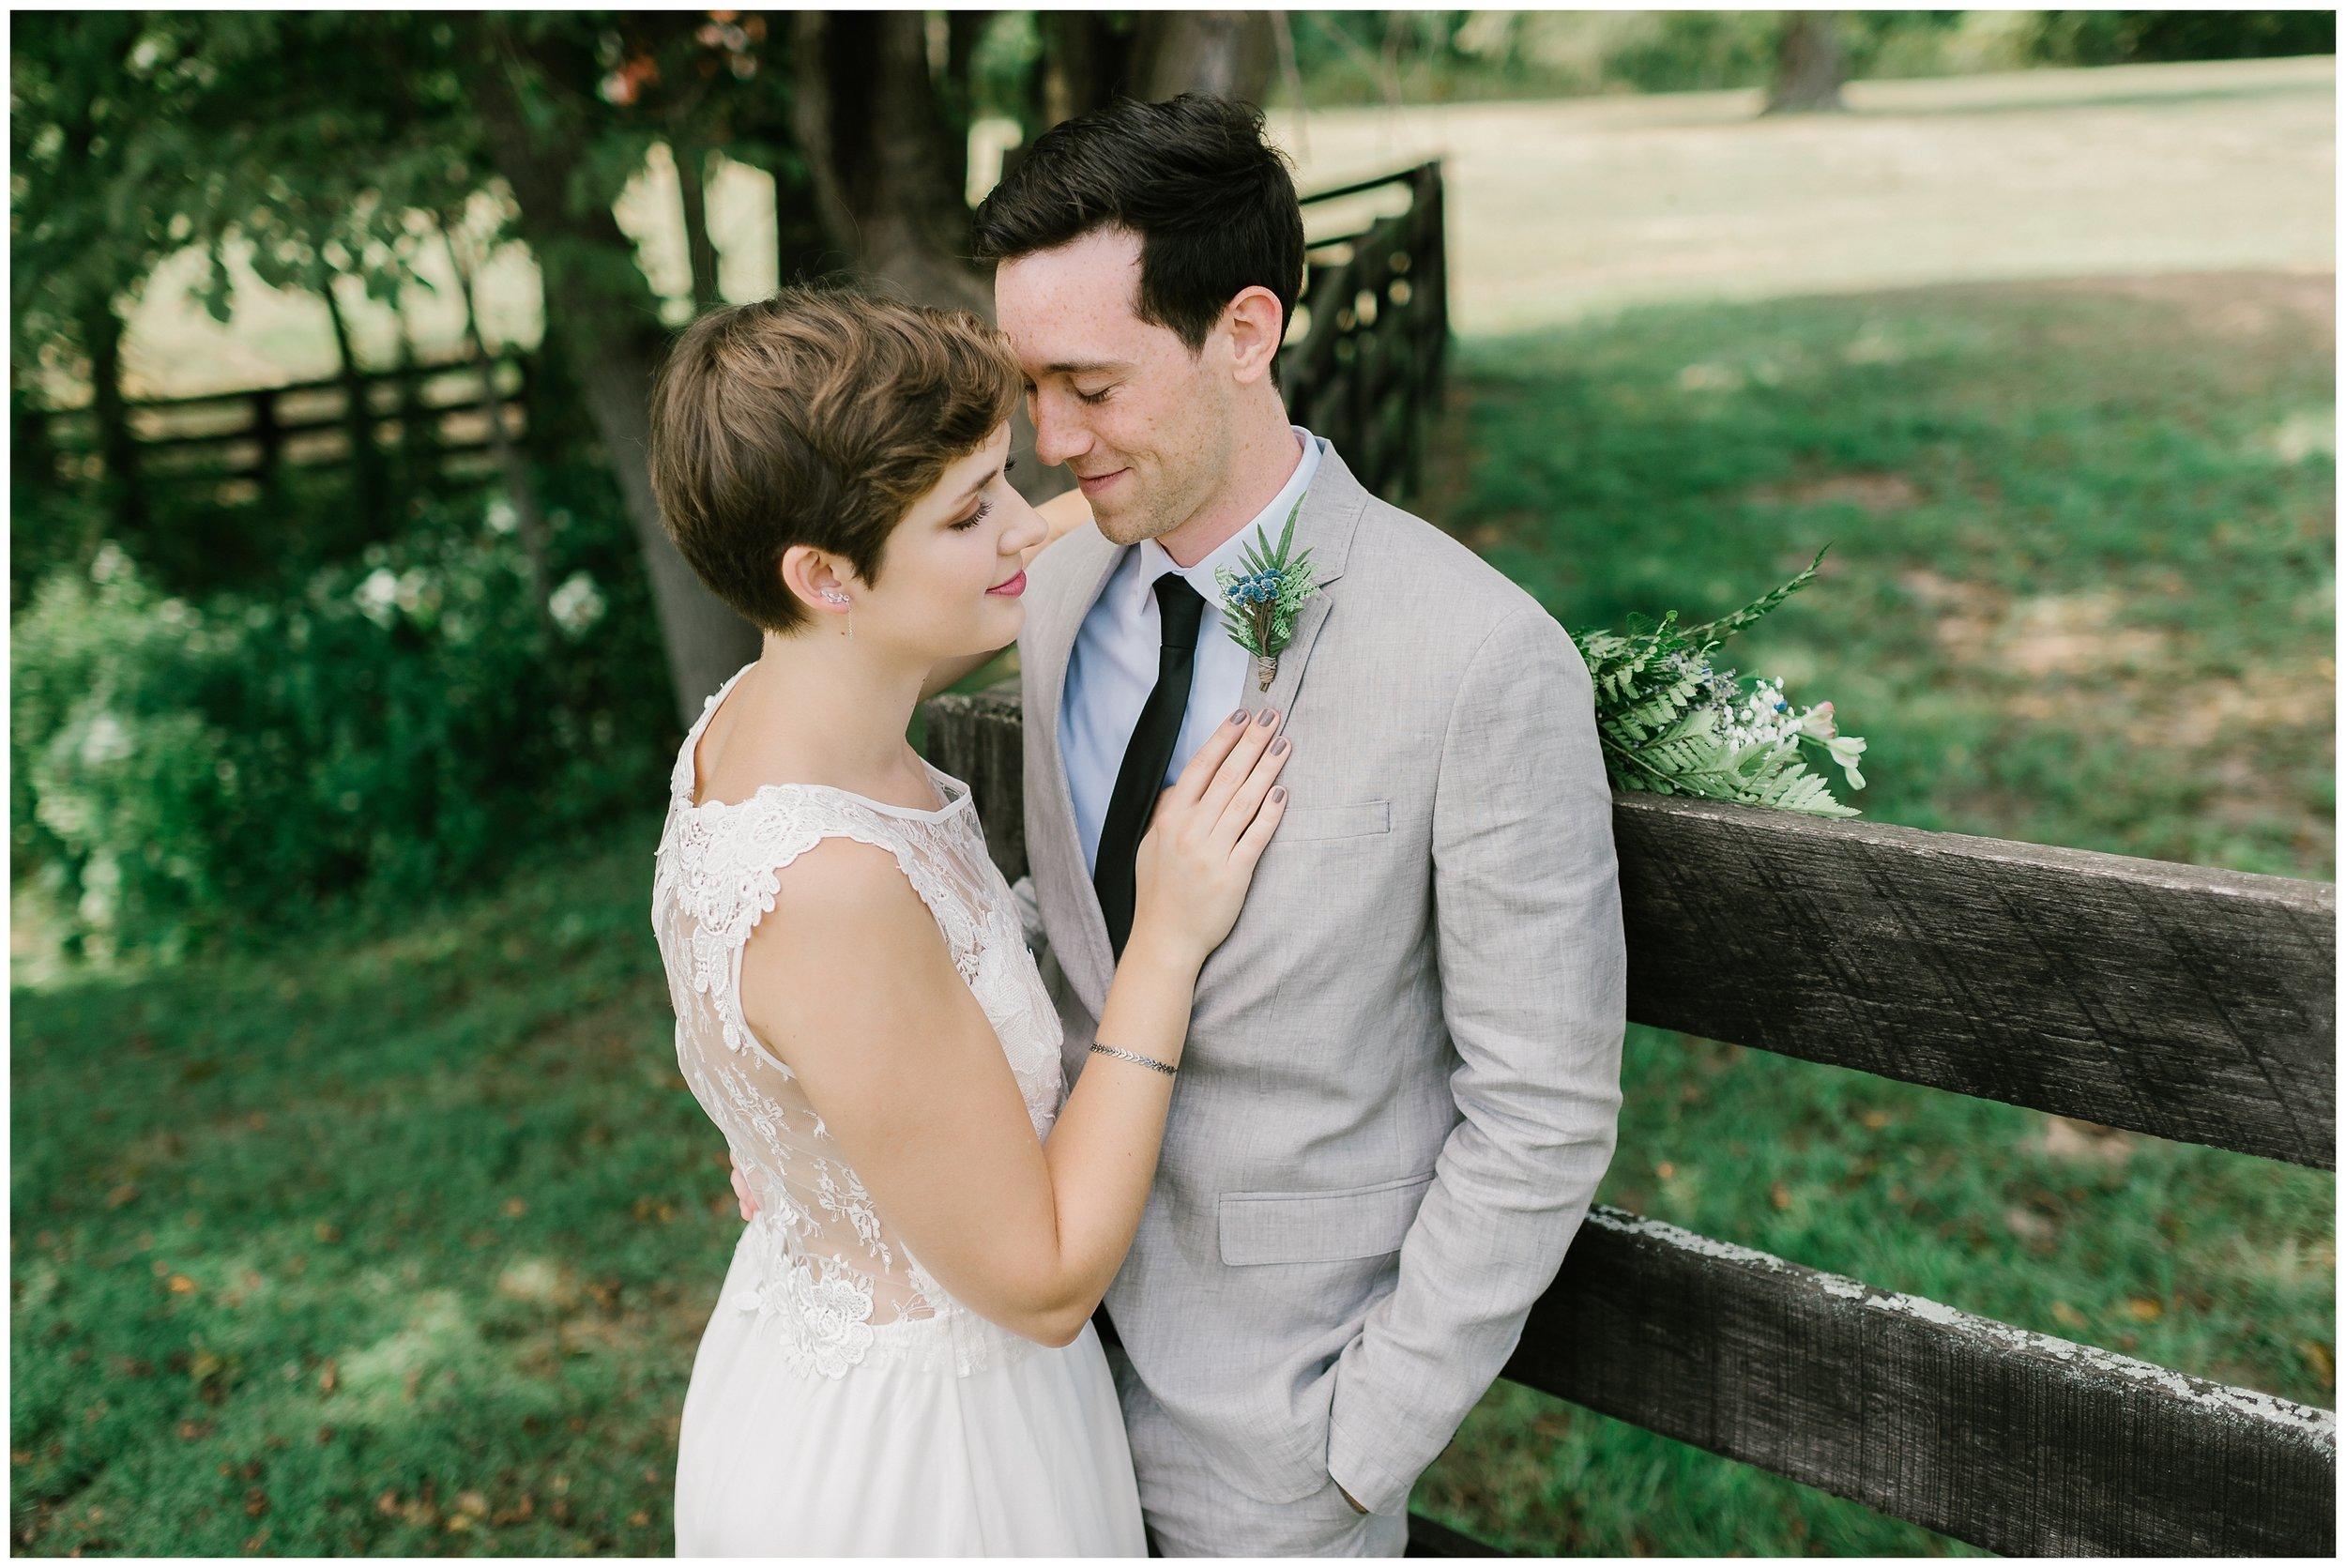 Rebecca_Shehorn_Photography_Indianapolis_Wedding_Photographer_7231.jpg